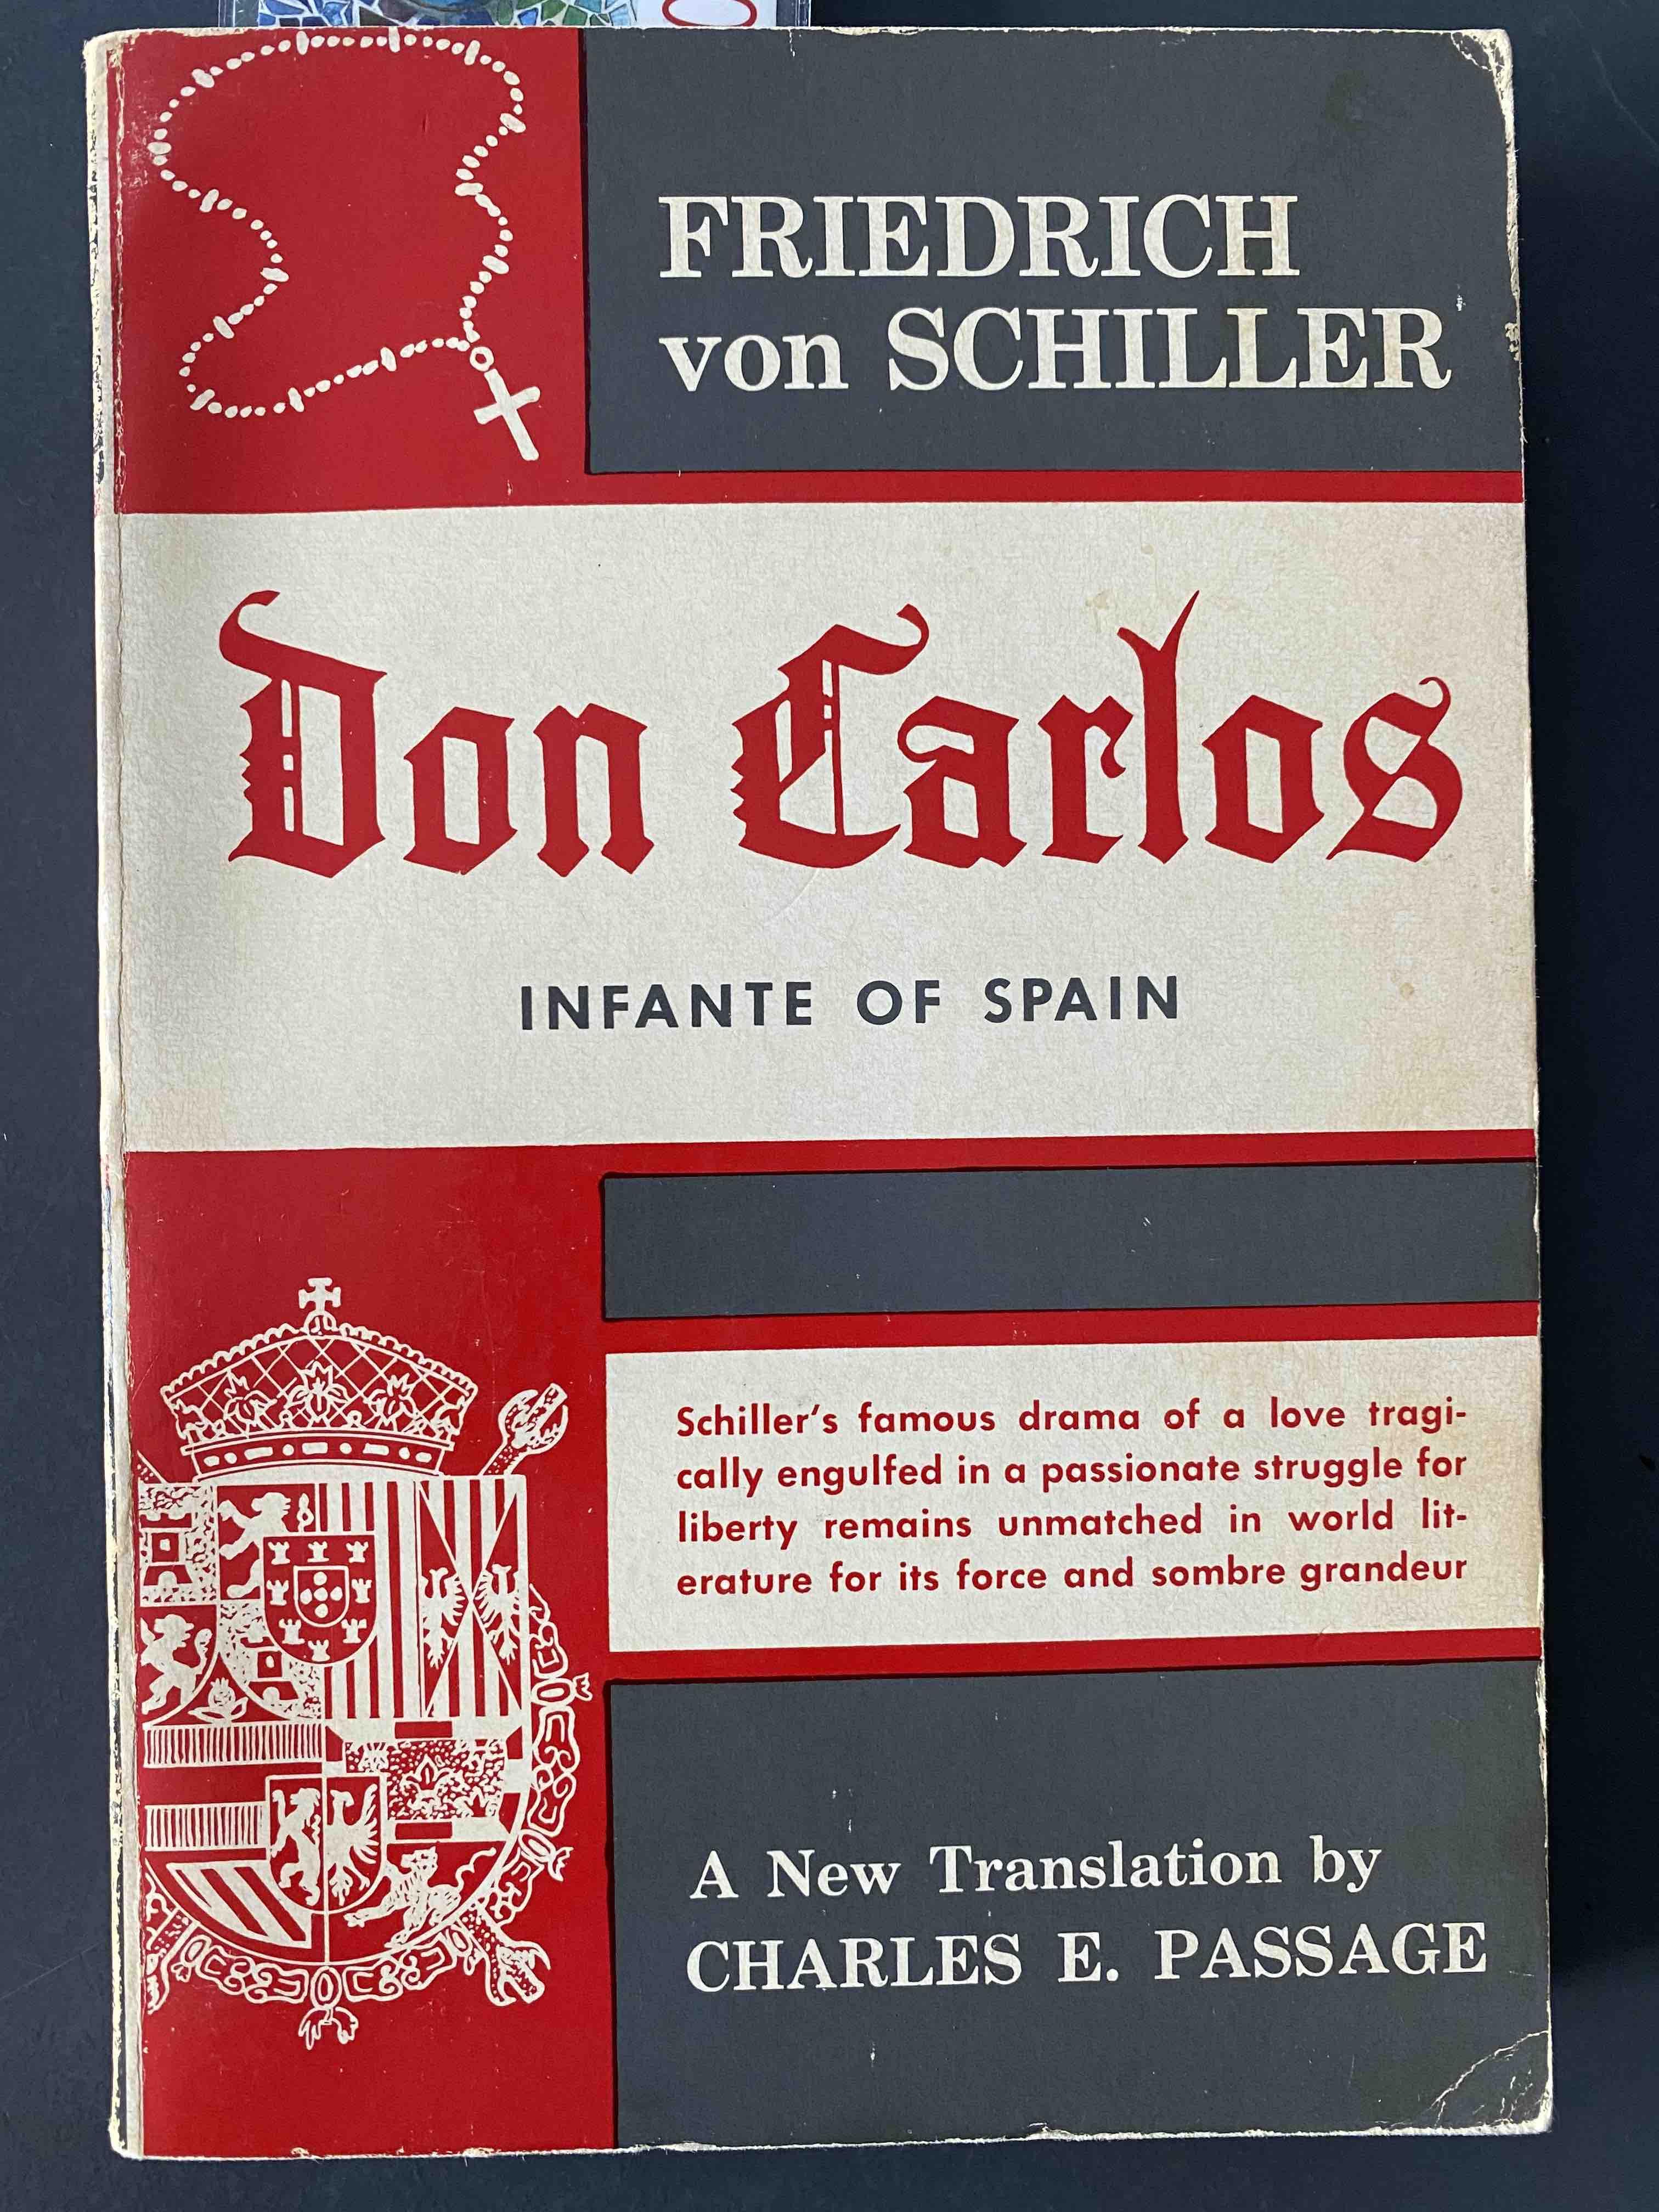 Friedrich Schiller, Don Carlos. Front cover.